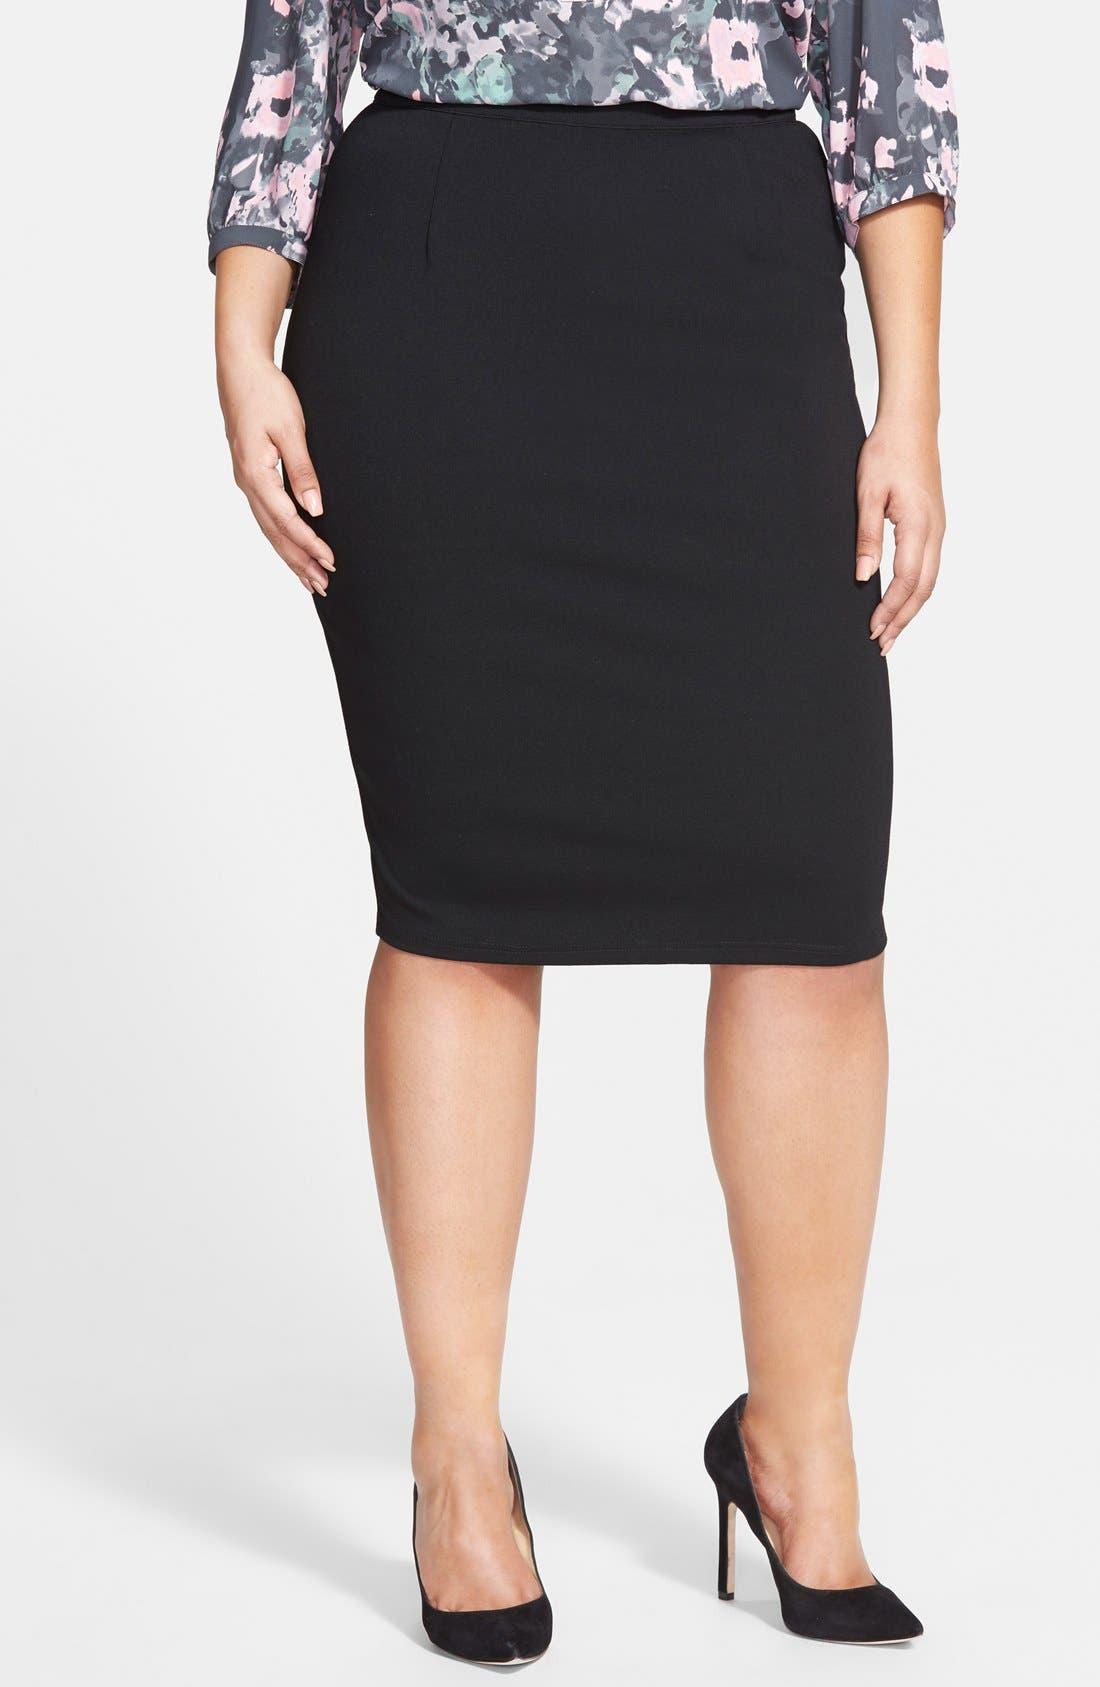 City Chic Back Zip Tube Skirt (Plus Size)